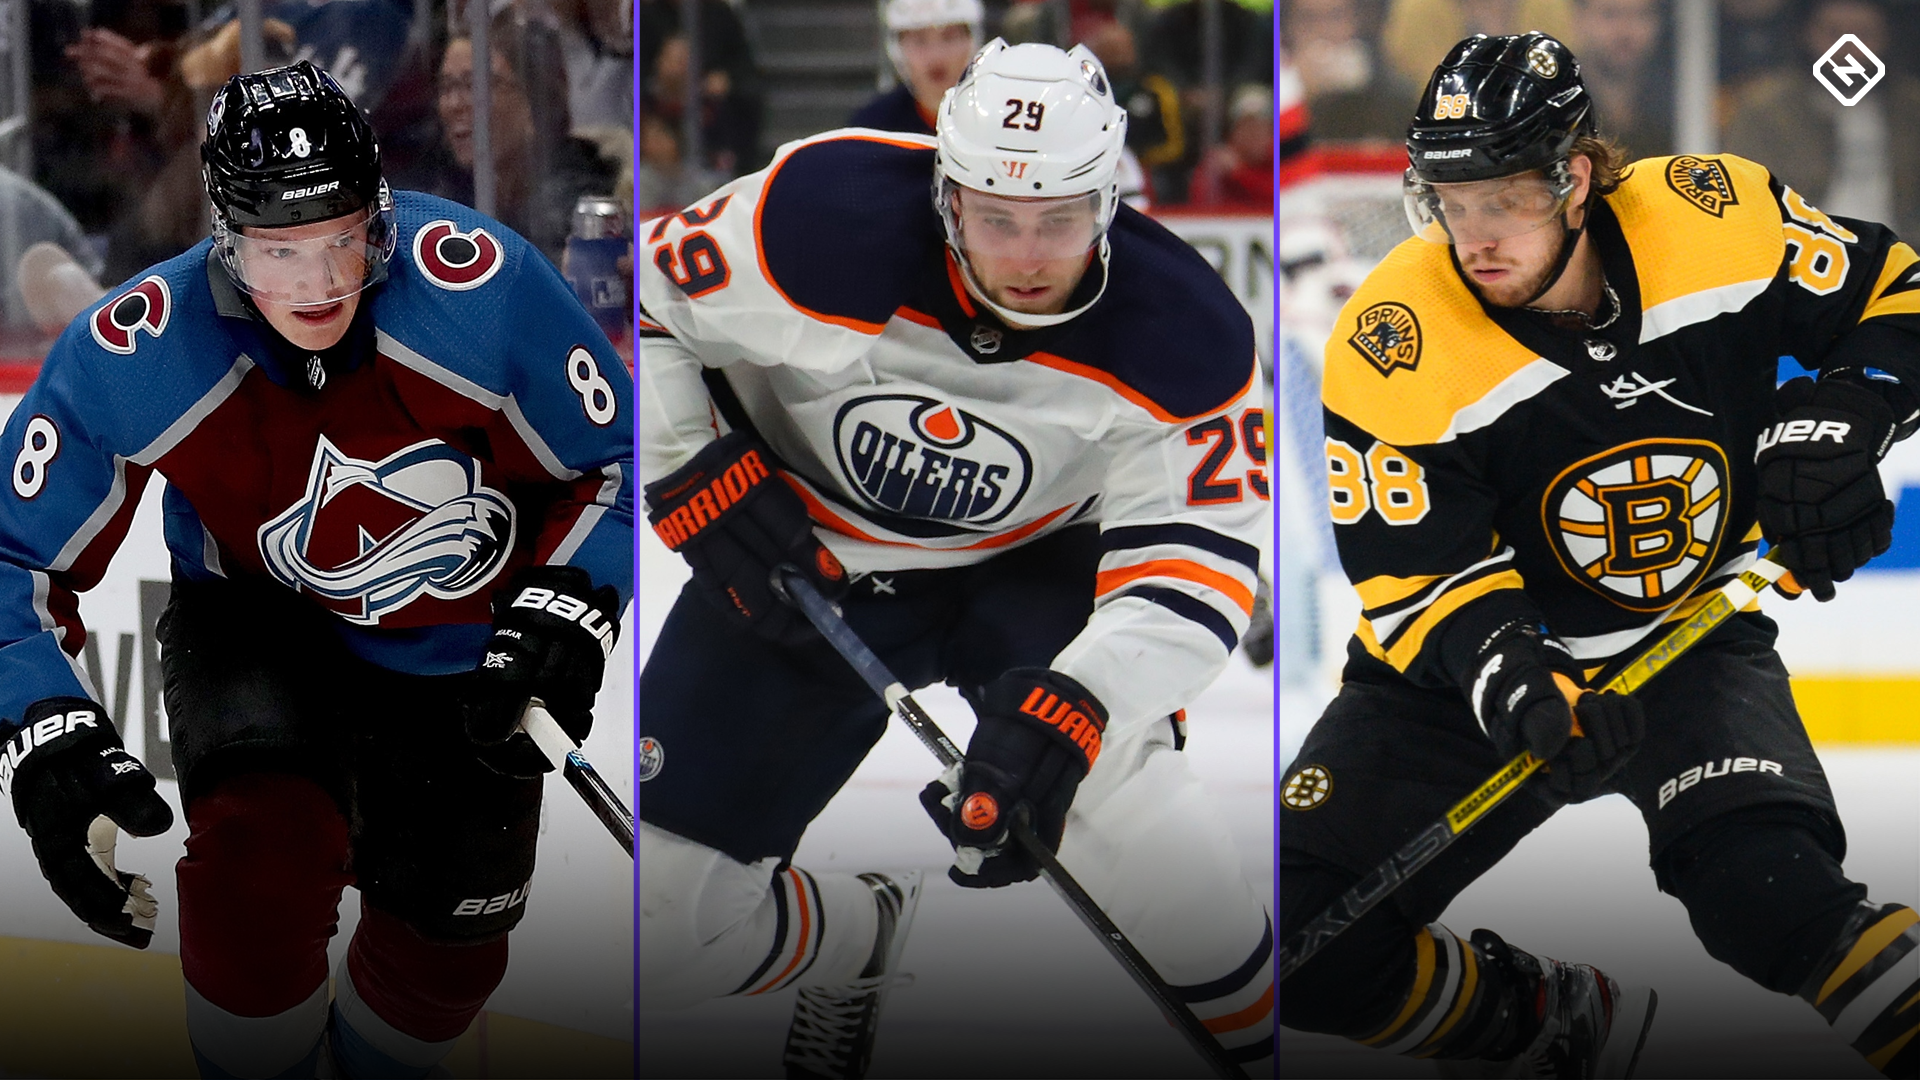 NHL 2019-20: Leon Draisaitl, David Pastrnak and 10 things we've learned so far this season